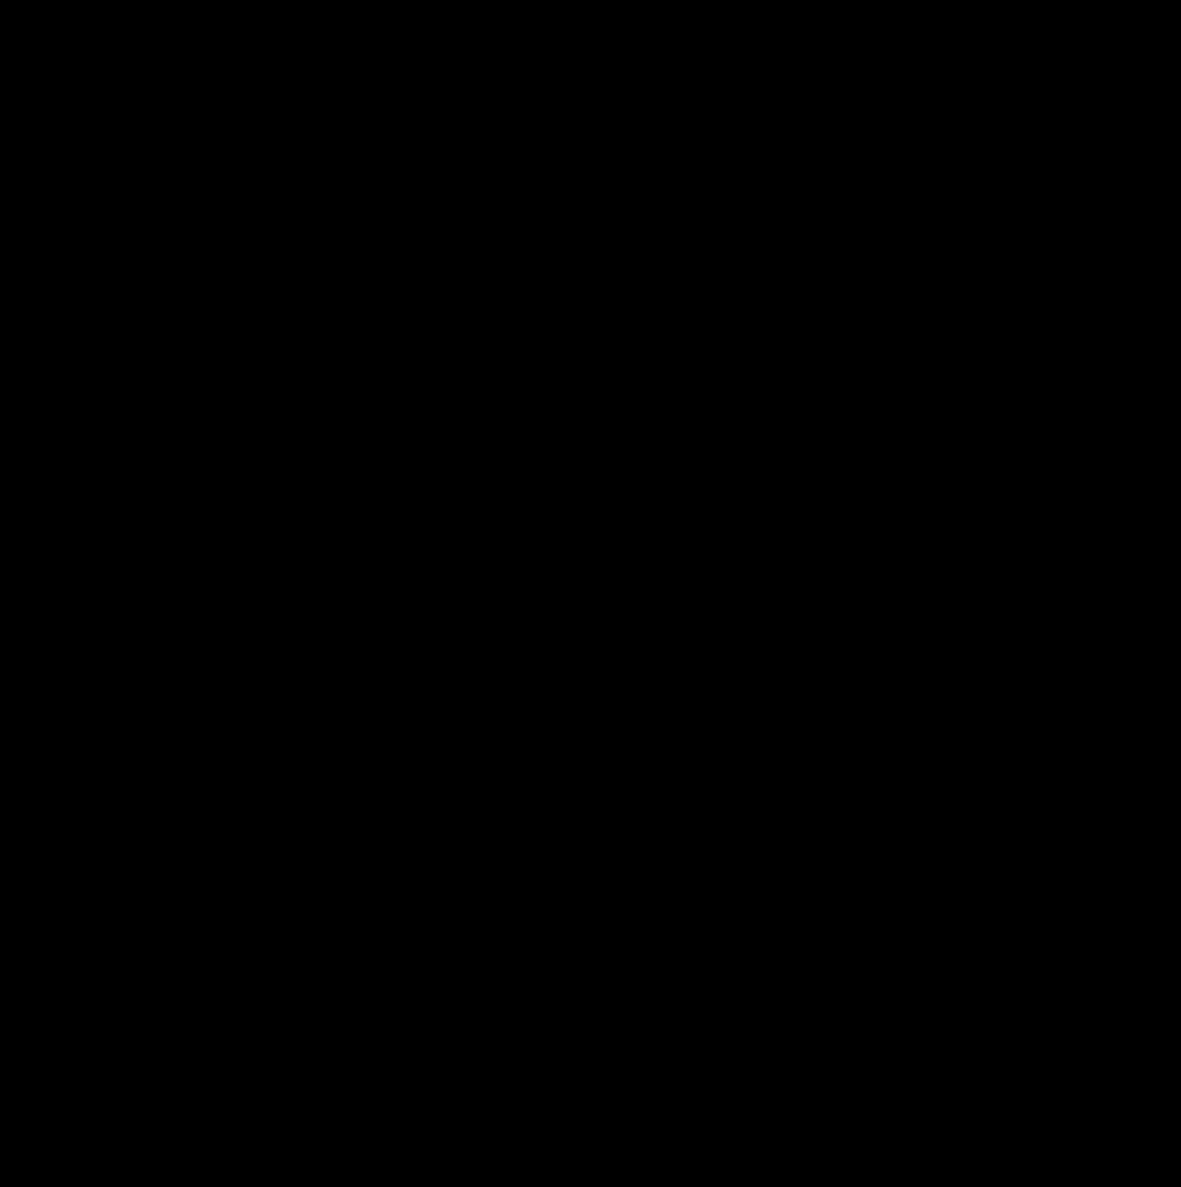 kloosterlogo